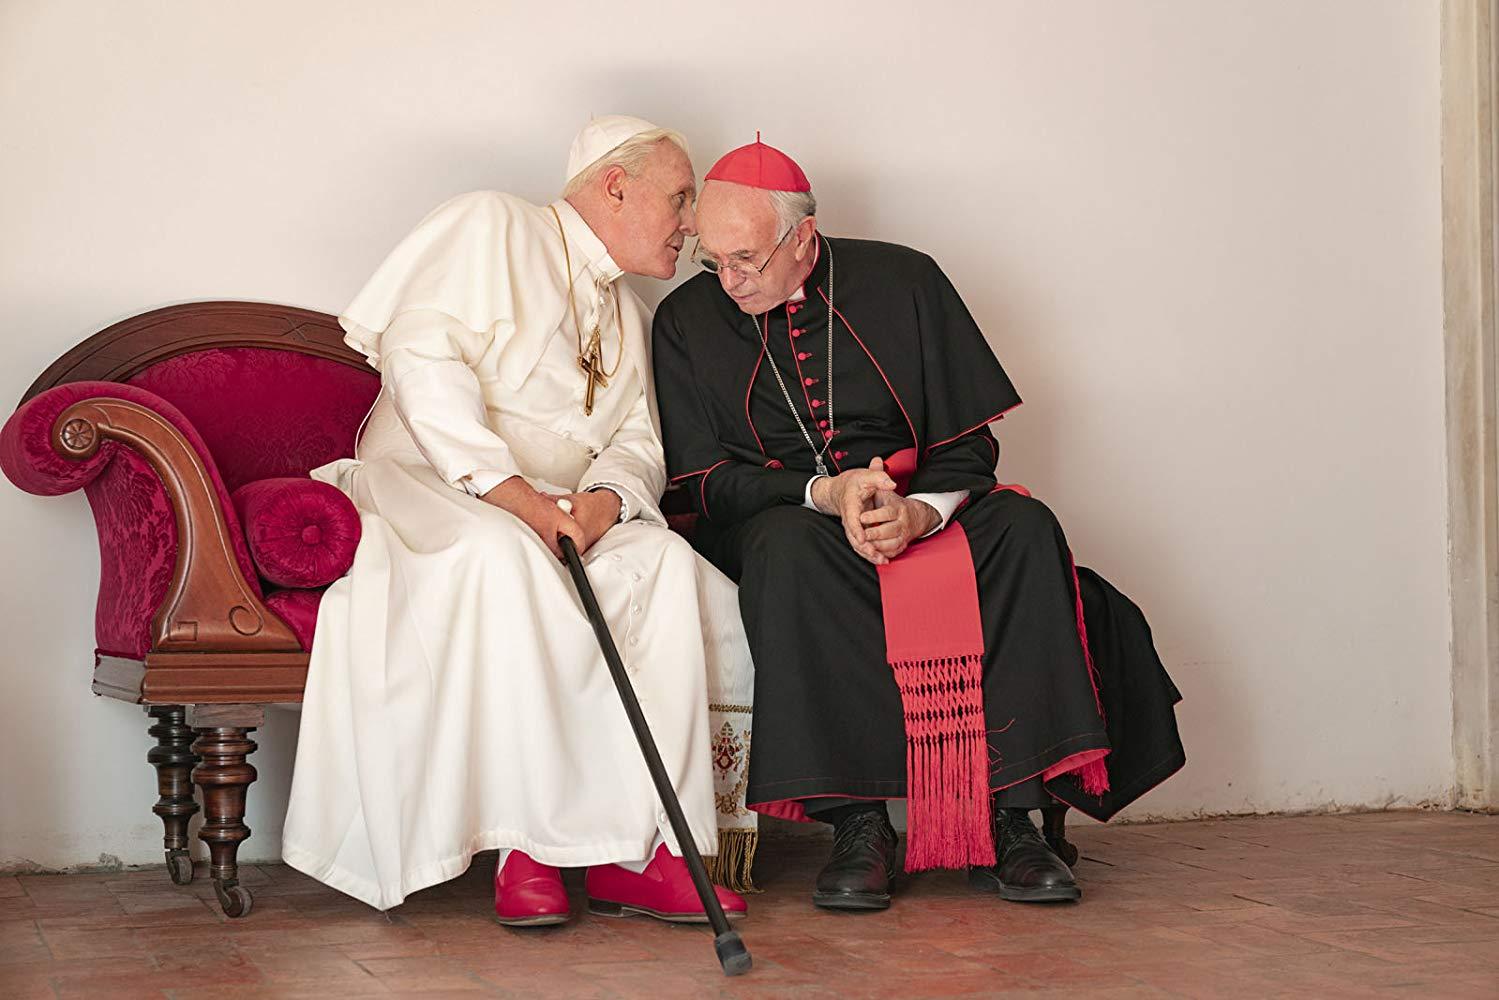 web2-the-two-popes-actors-imdb.jpg